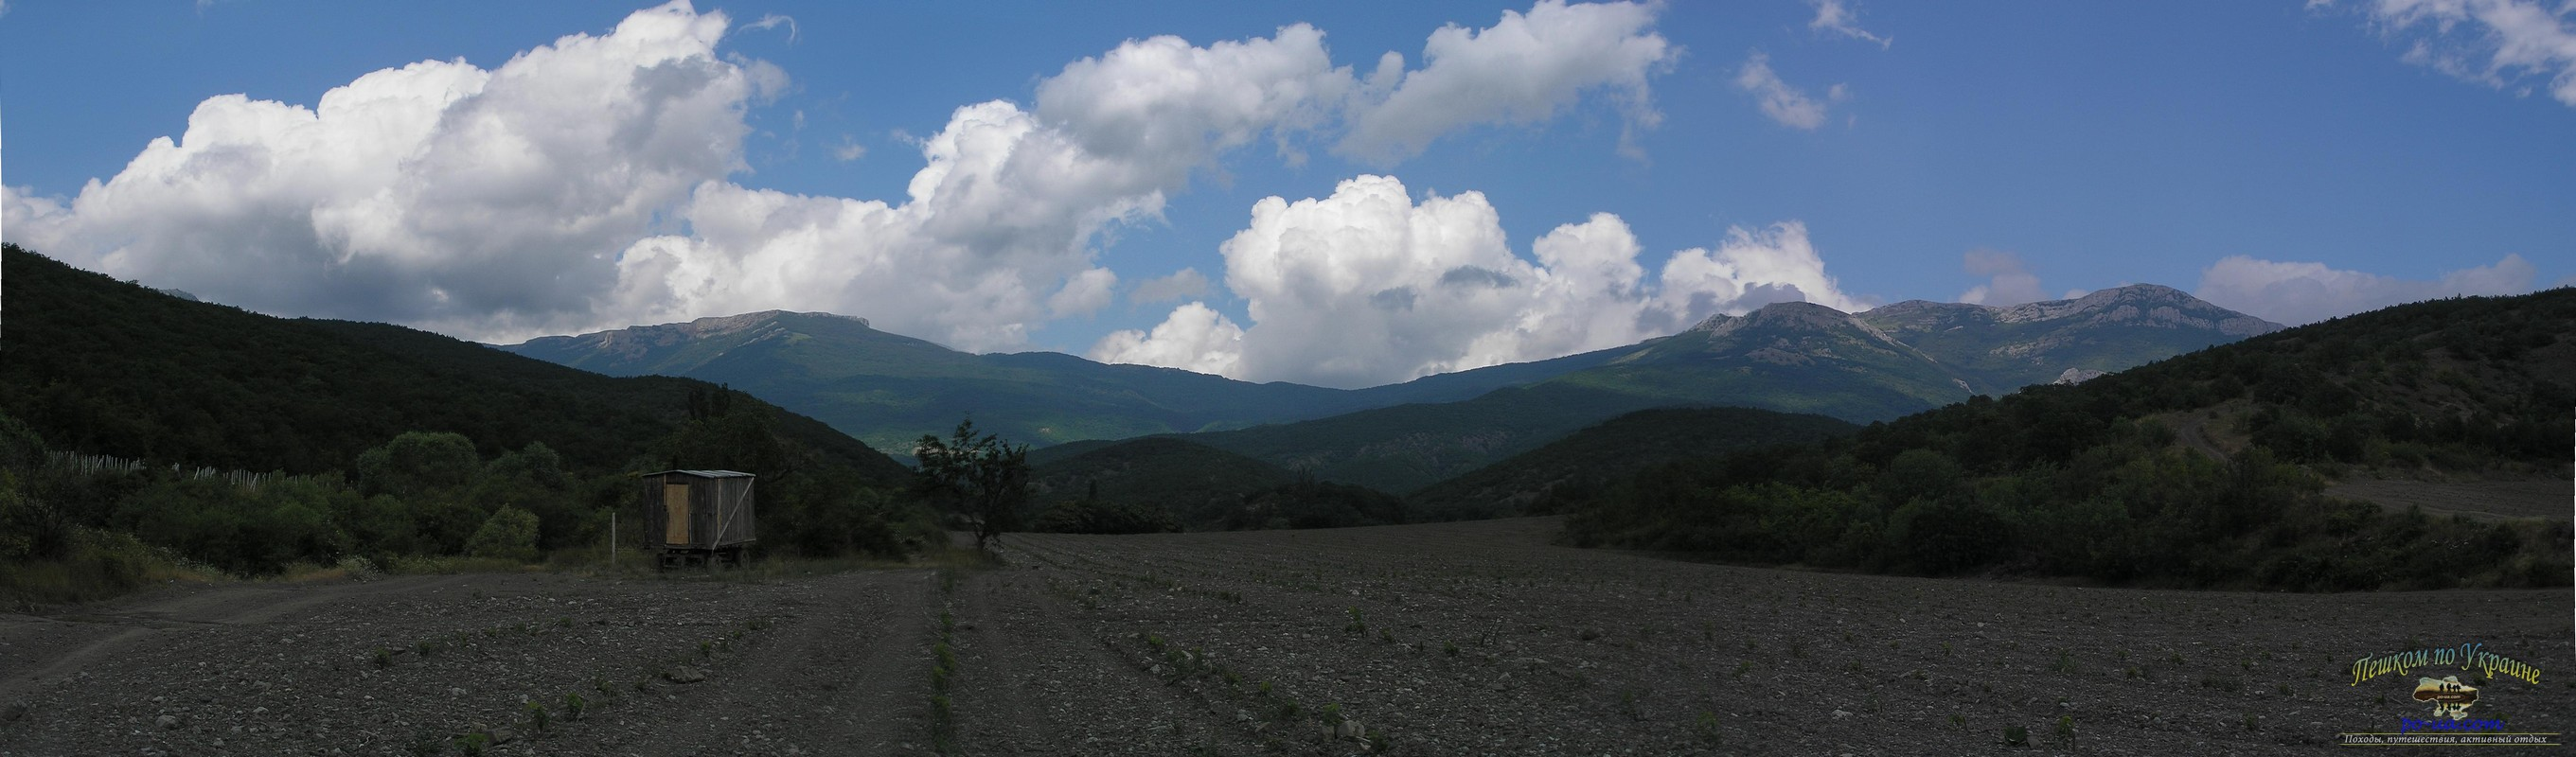 Вид на Тирке и караби-яйлу с побережья